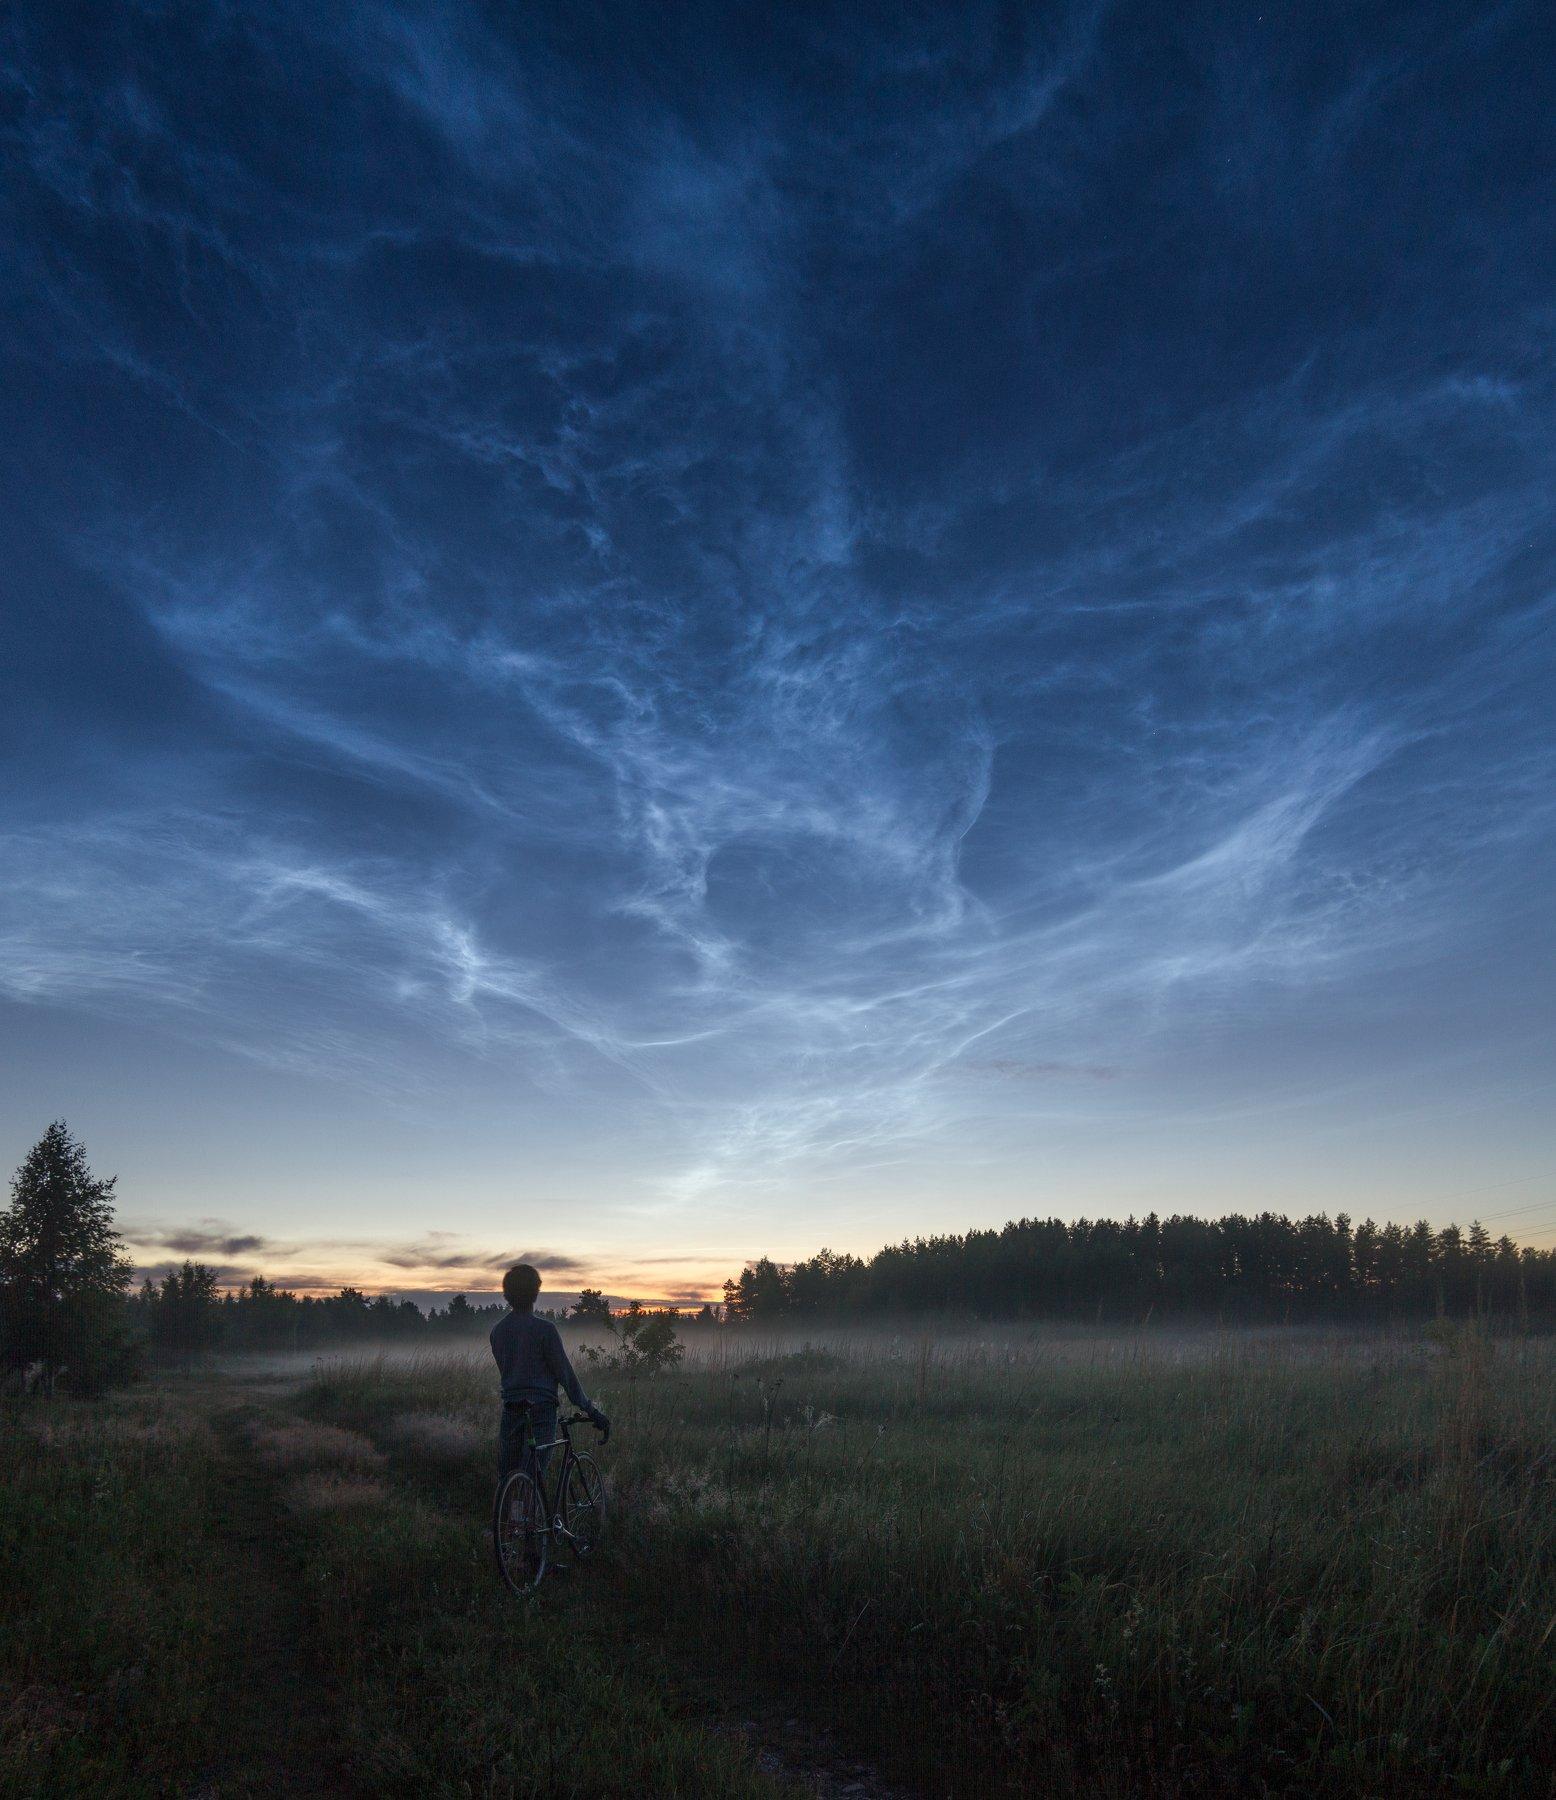 ночь велосипед туман лес серебристые облака луна moon night travel cycling, Евгений Озеров